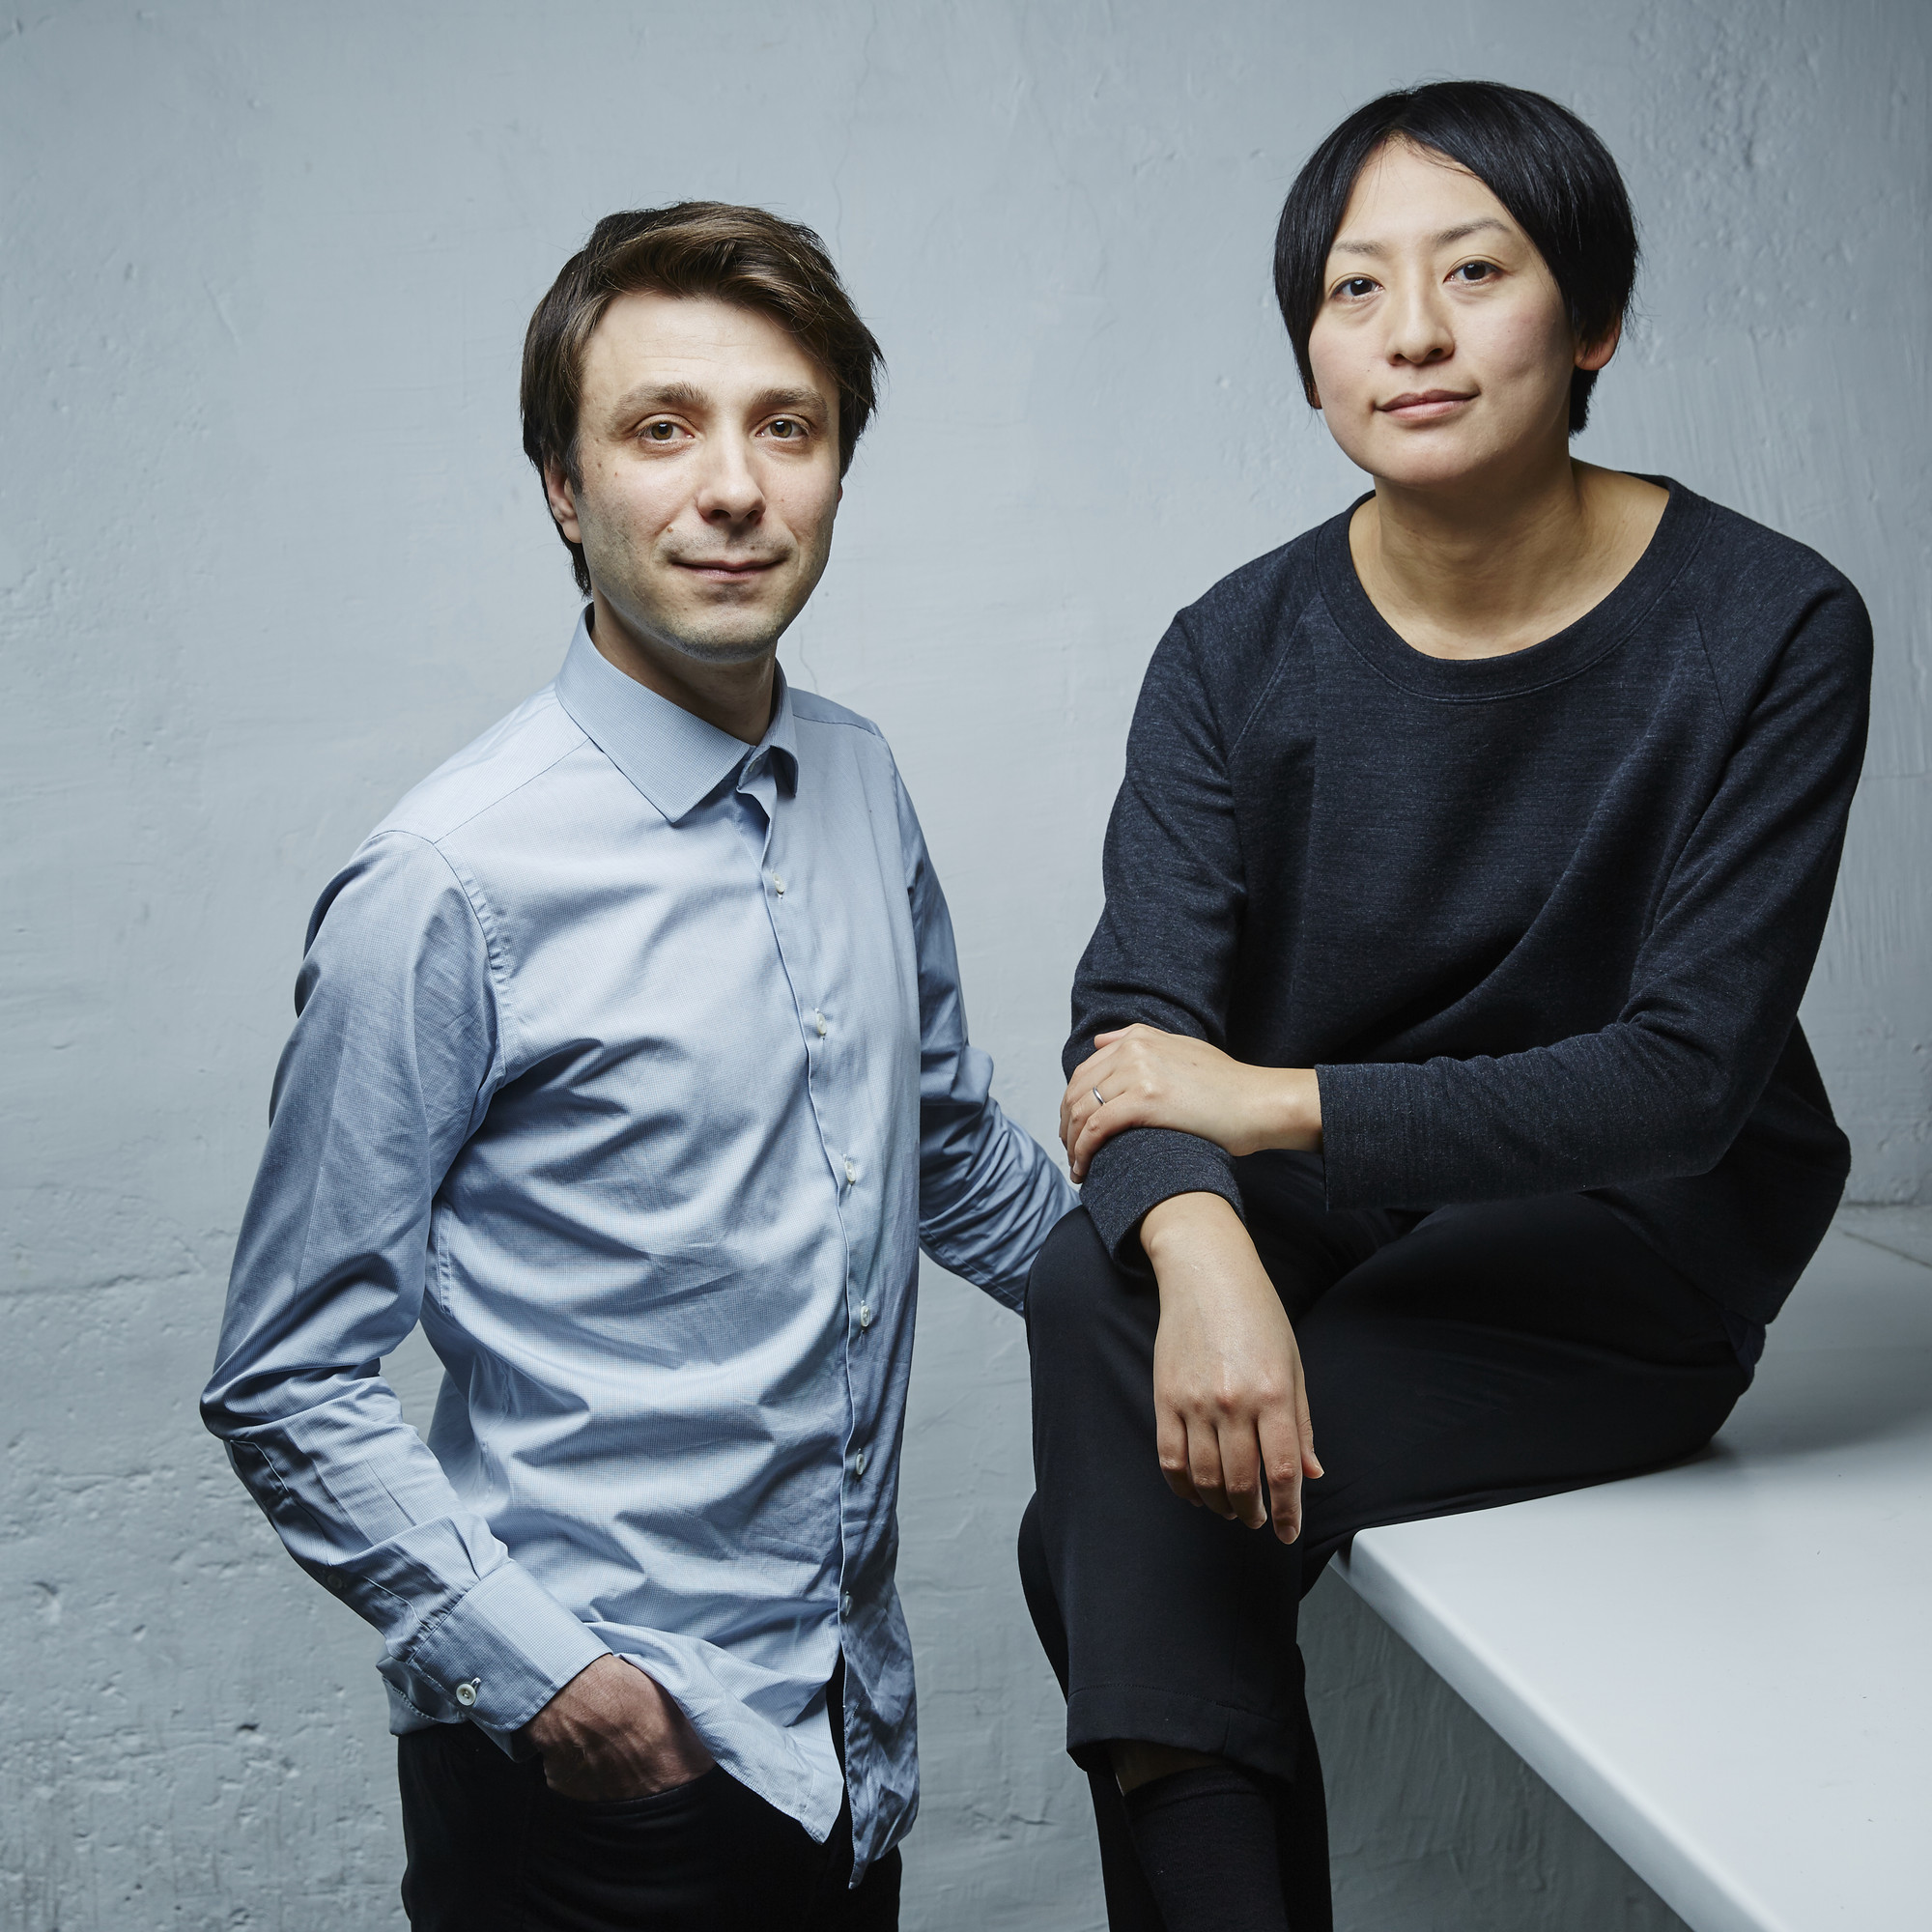 Nicolas Moreau y Hiroko Kusunoki . Image Cortesia de Moreau Kusunoki Architectes